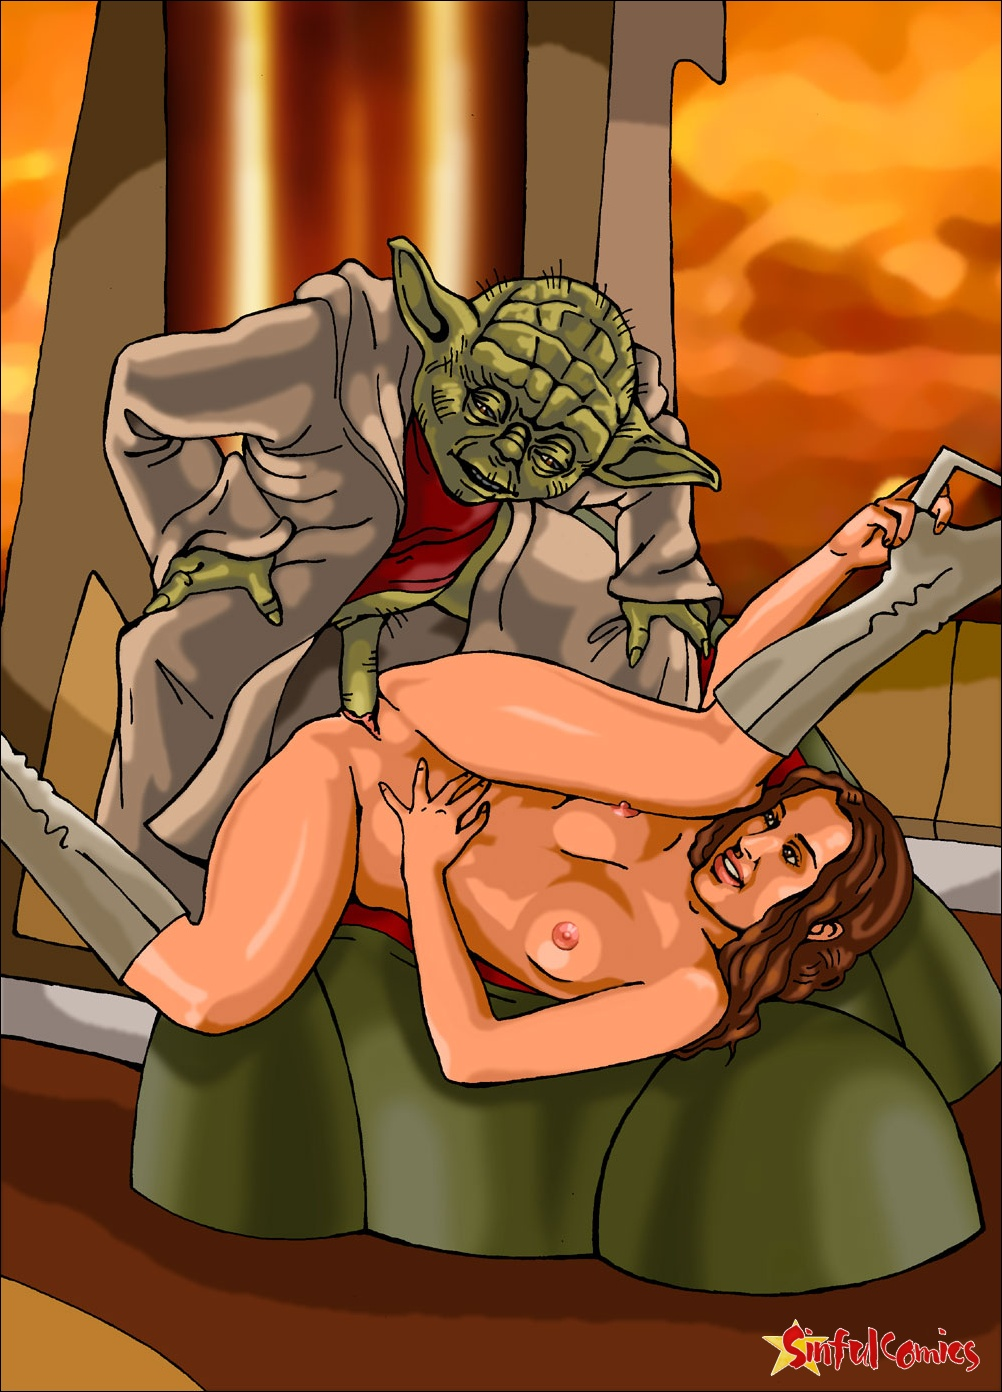 Padme real nude pic sexy comics